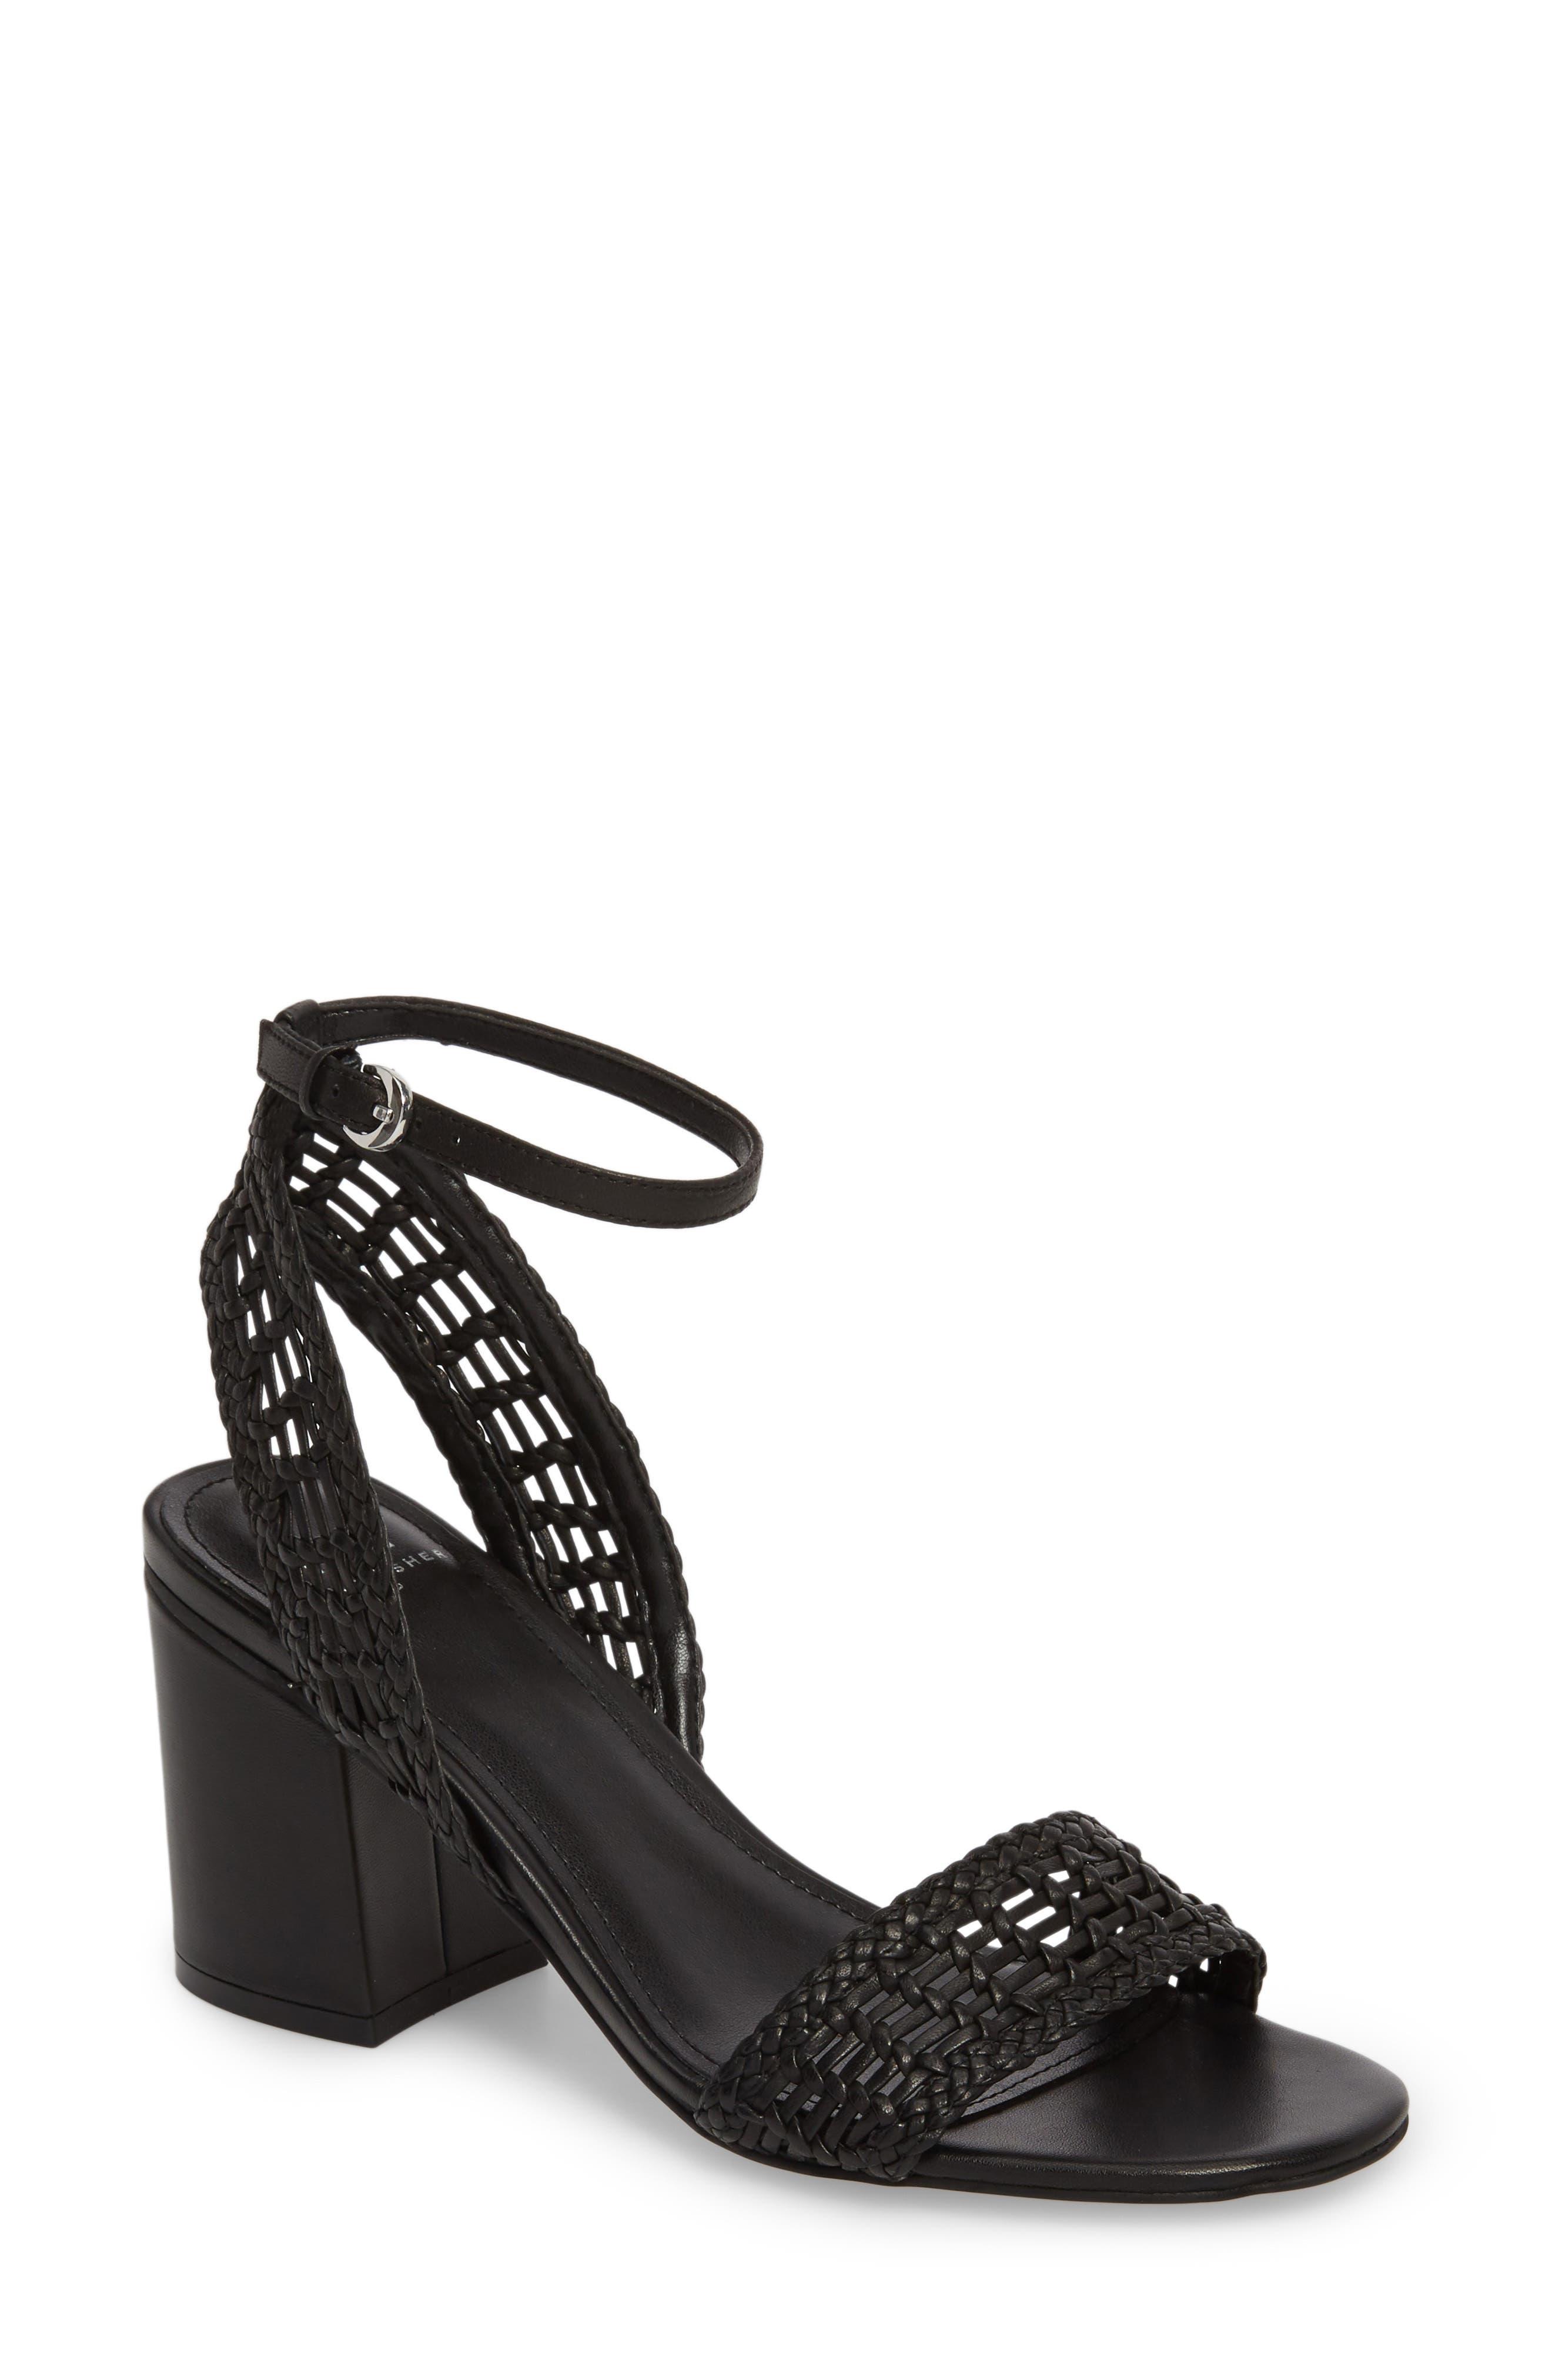 Amere Ankle Strap Sandal,                         Main,                         color, Black Leather